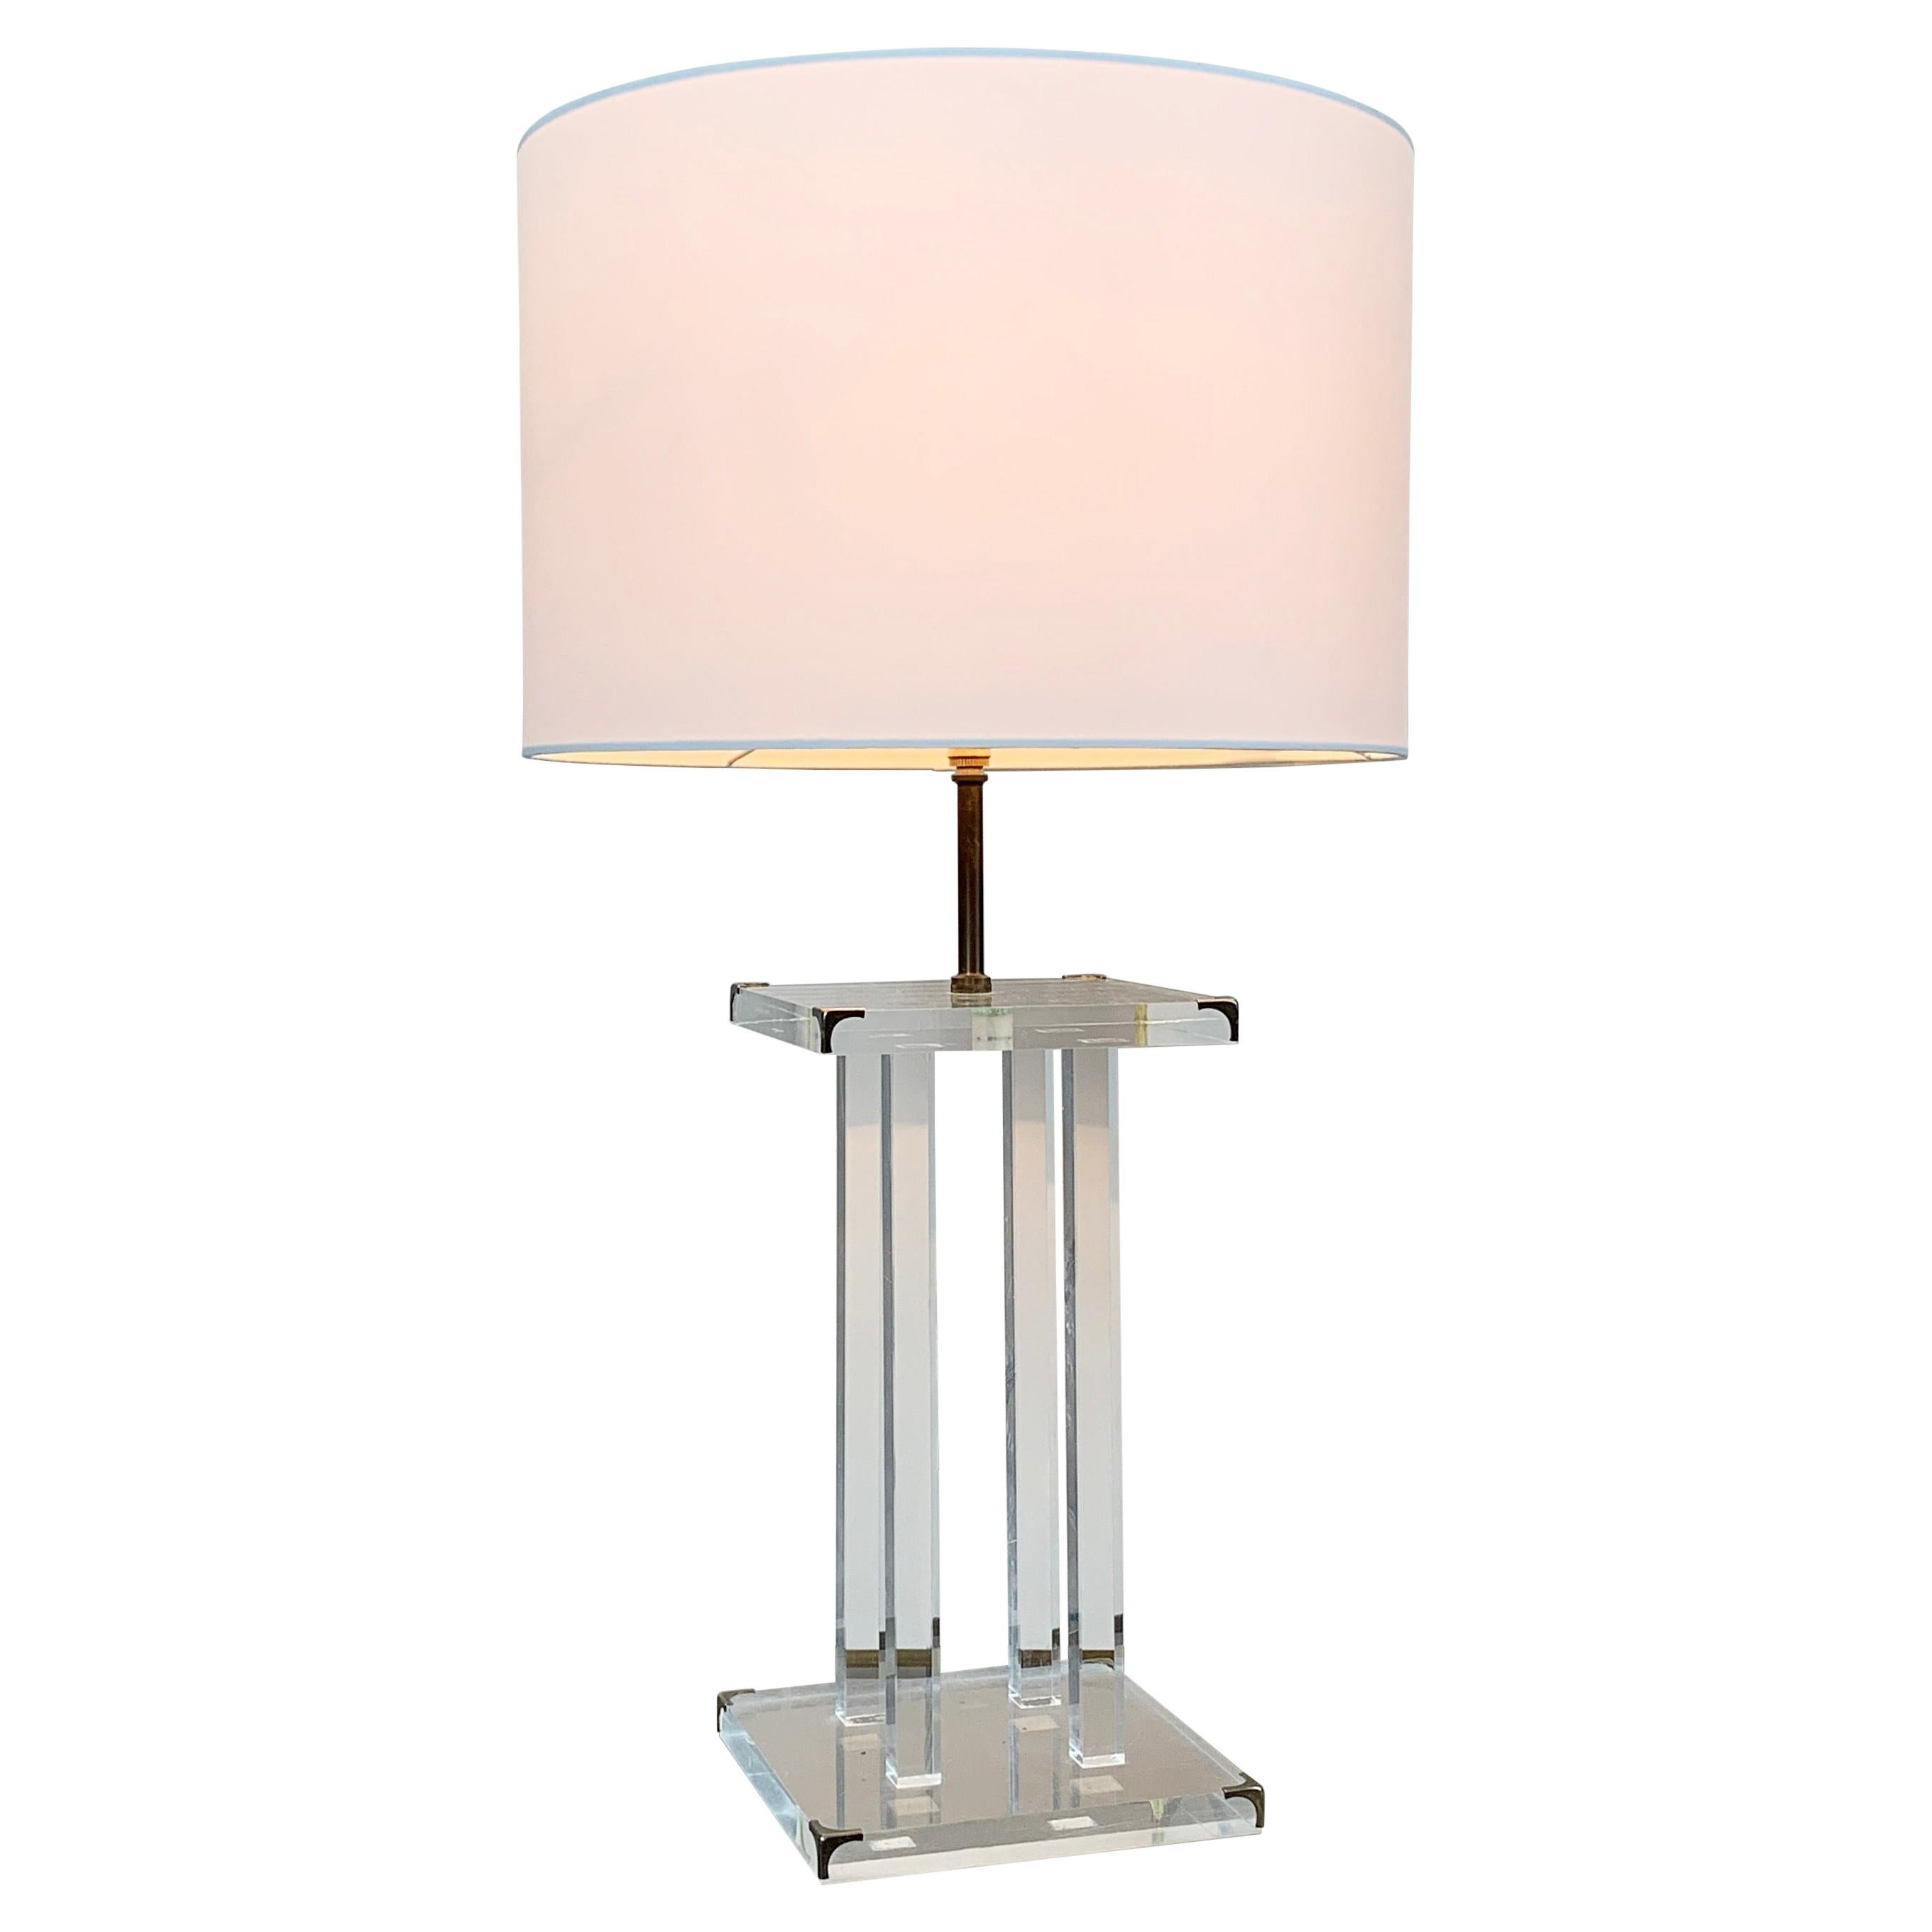 David Lange for Roche Bobois Lucite Table Lamp